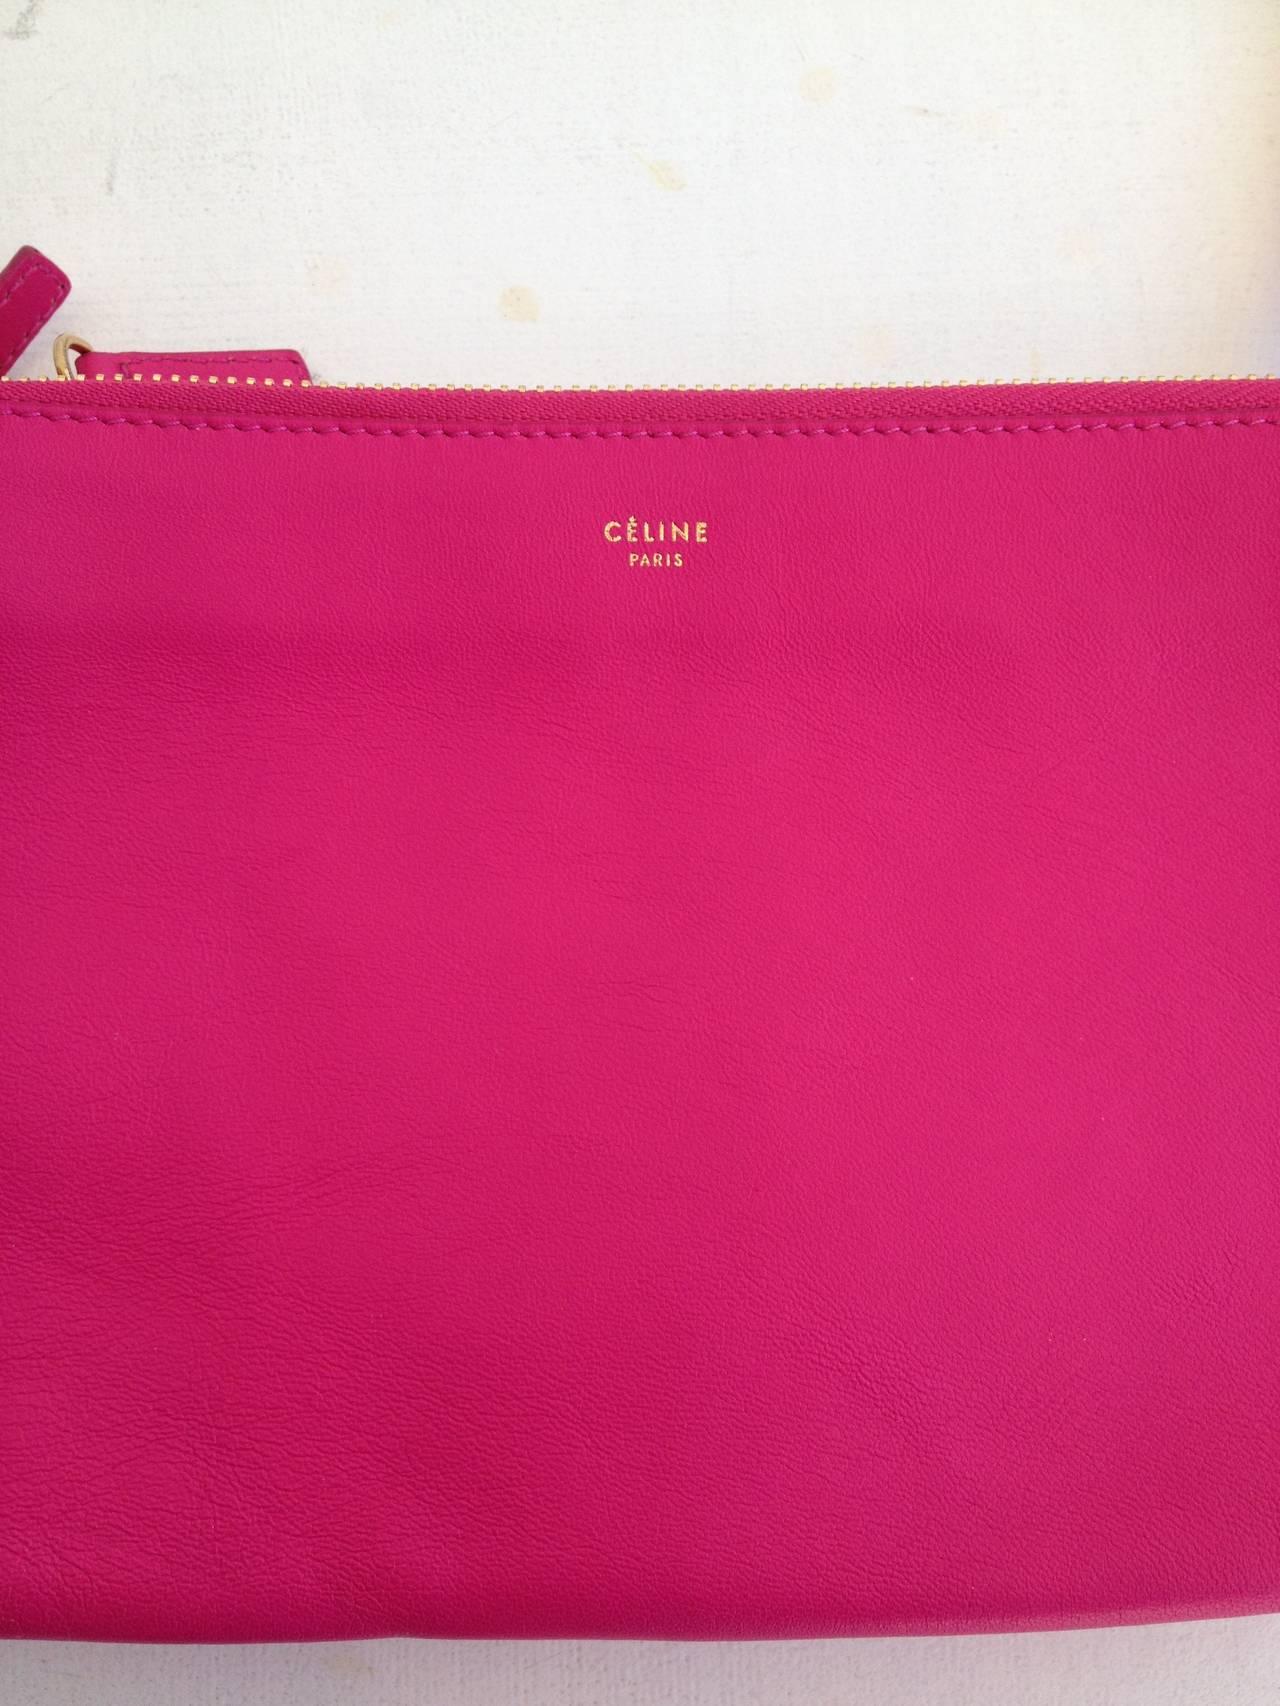 celine trio leather clutch bag